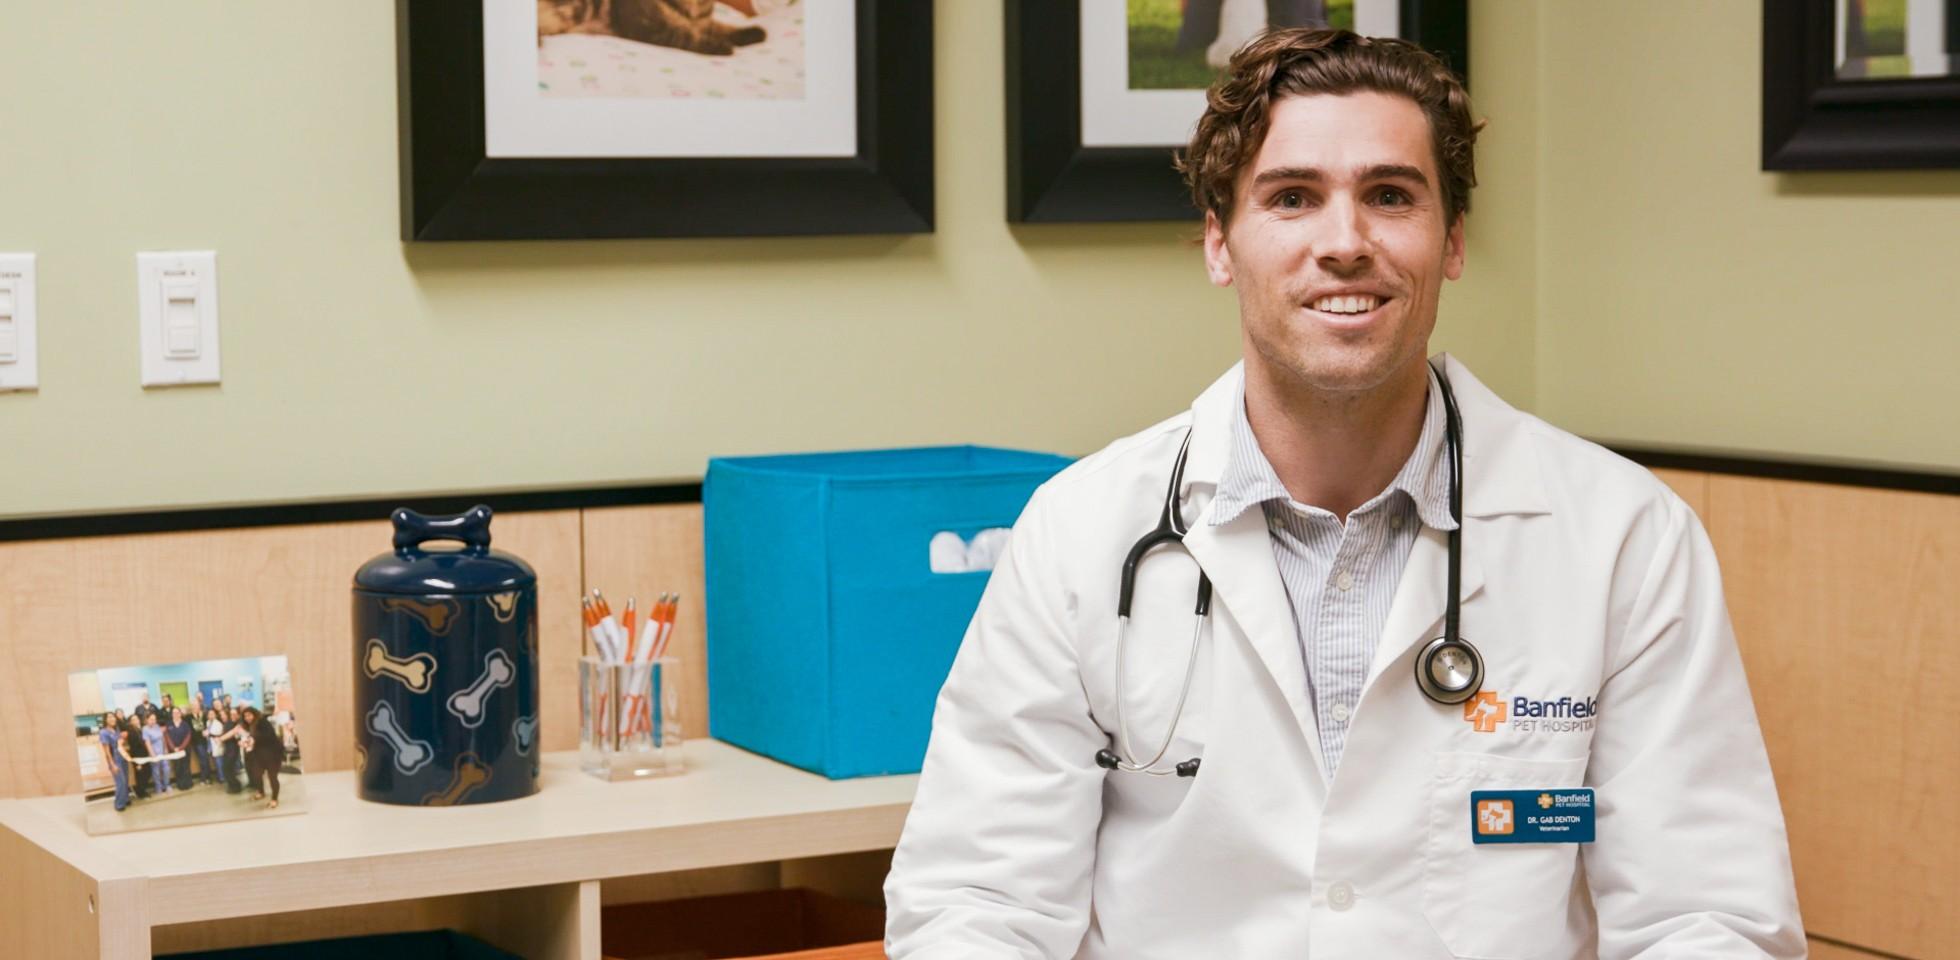 Gabre Denton, Veterinarian - Banfield Pet Hospital Careers